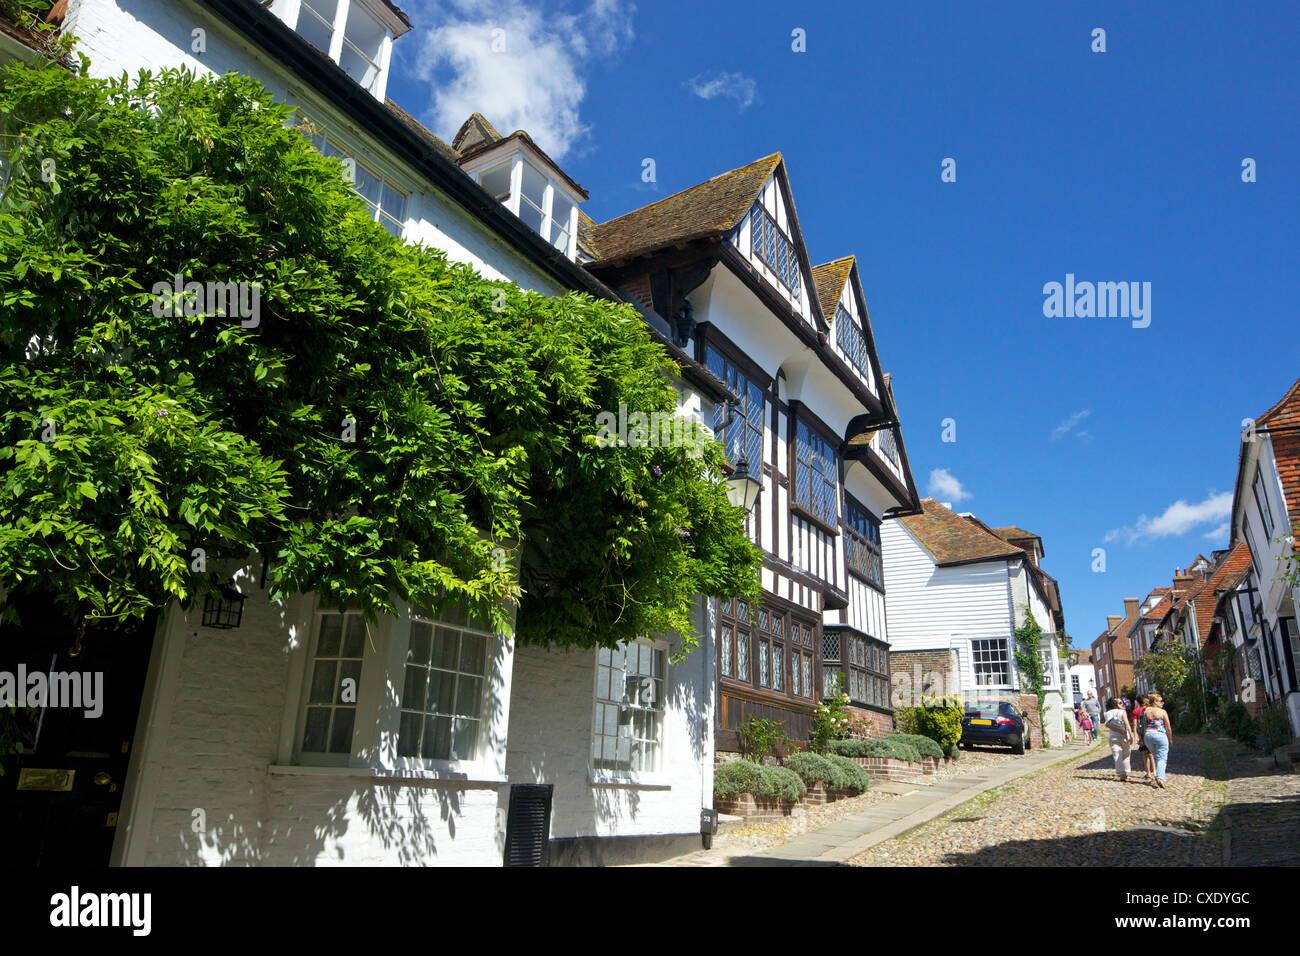 Mermaid Street in summer sunshine, Rye, East Sussex, England, United Kingdom, Europe - Stock Image